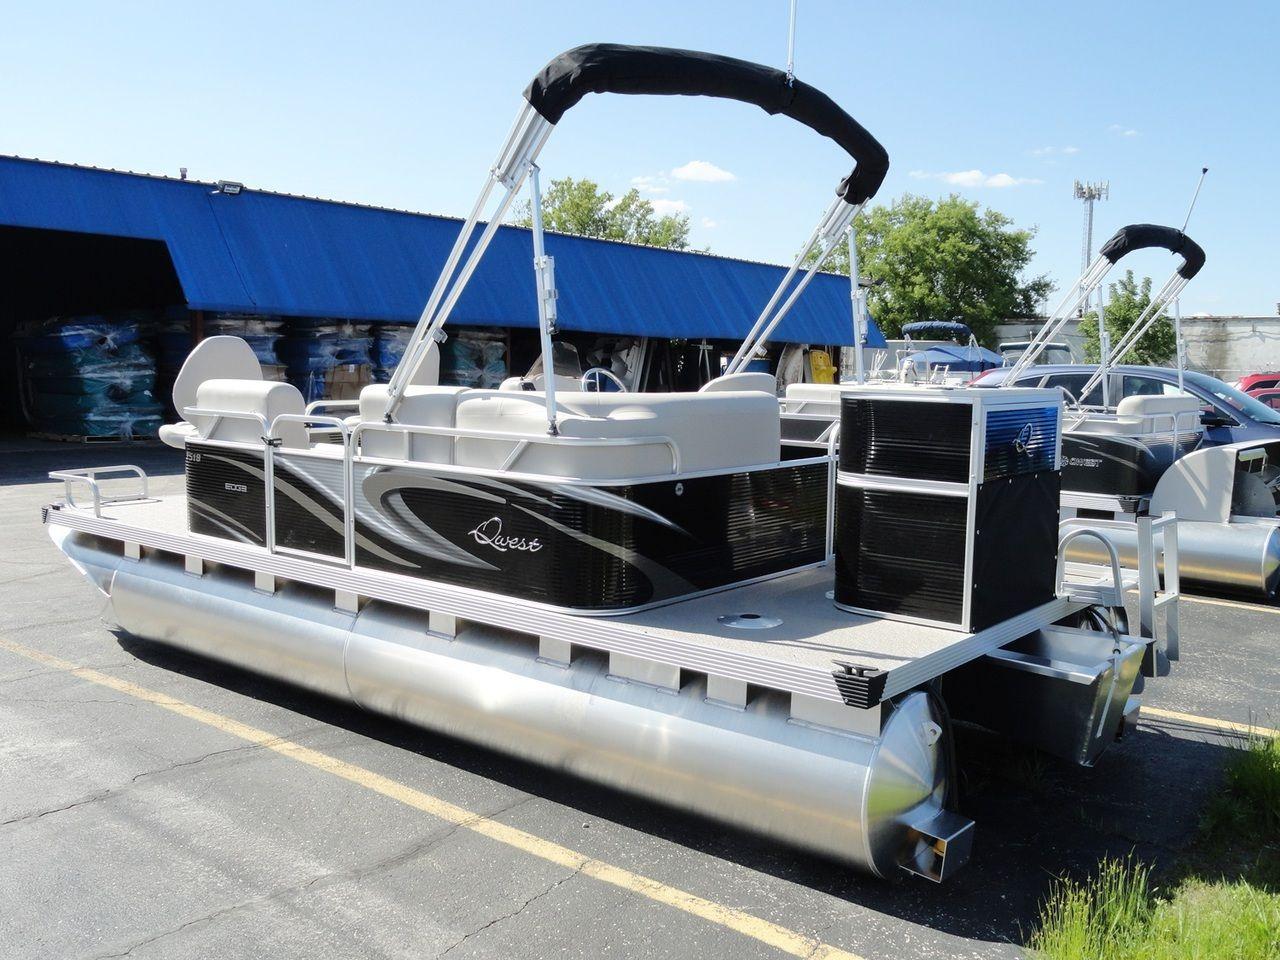 Apex marine fishing pontoon boat qwest edge 7518 angler for Angler fishing boat